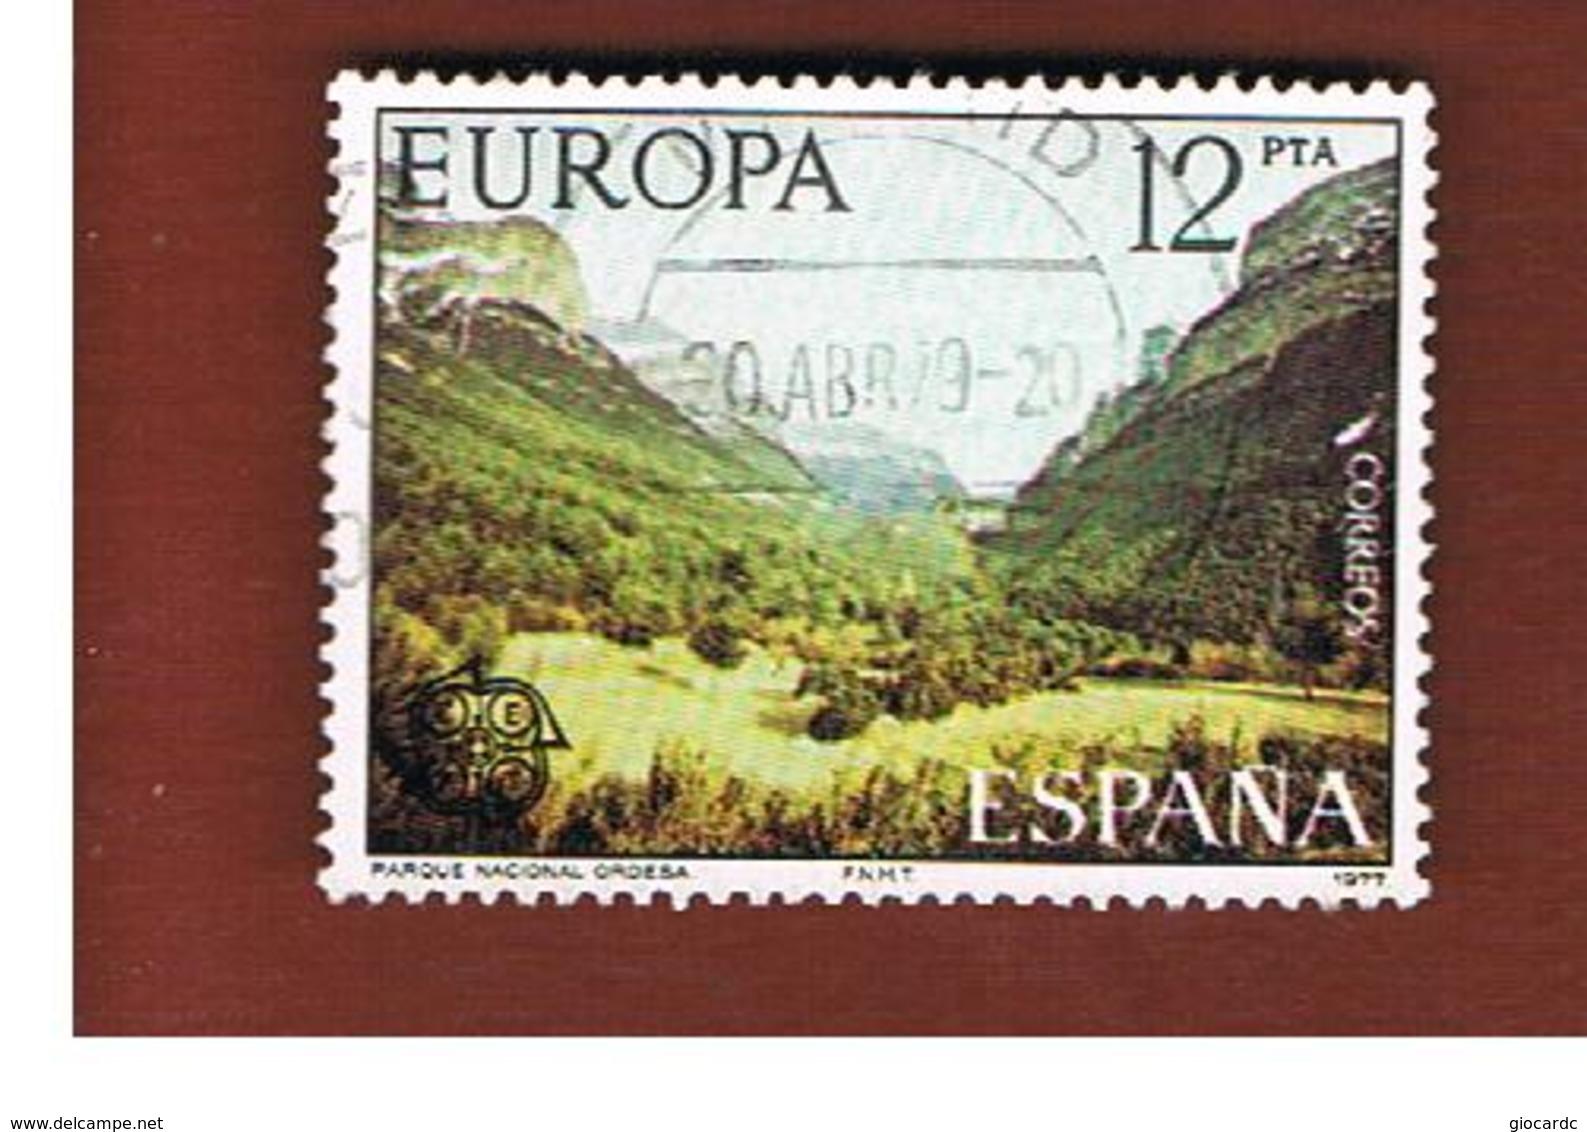 SPAGNA (SPAIN)  - 1977 EUROPA  - USED - Europa-CEPT